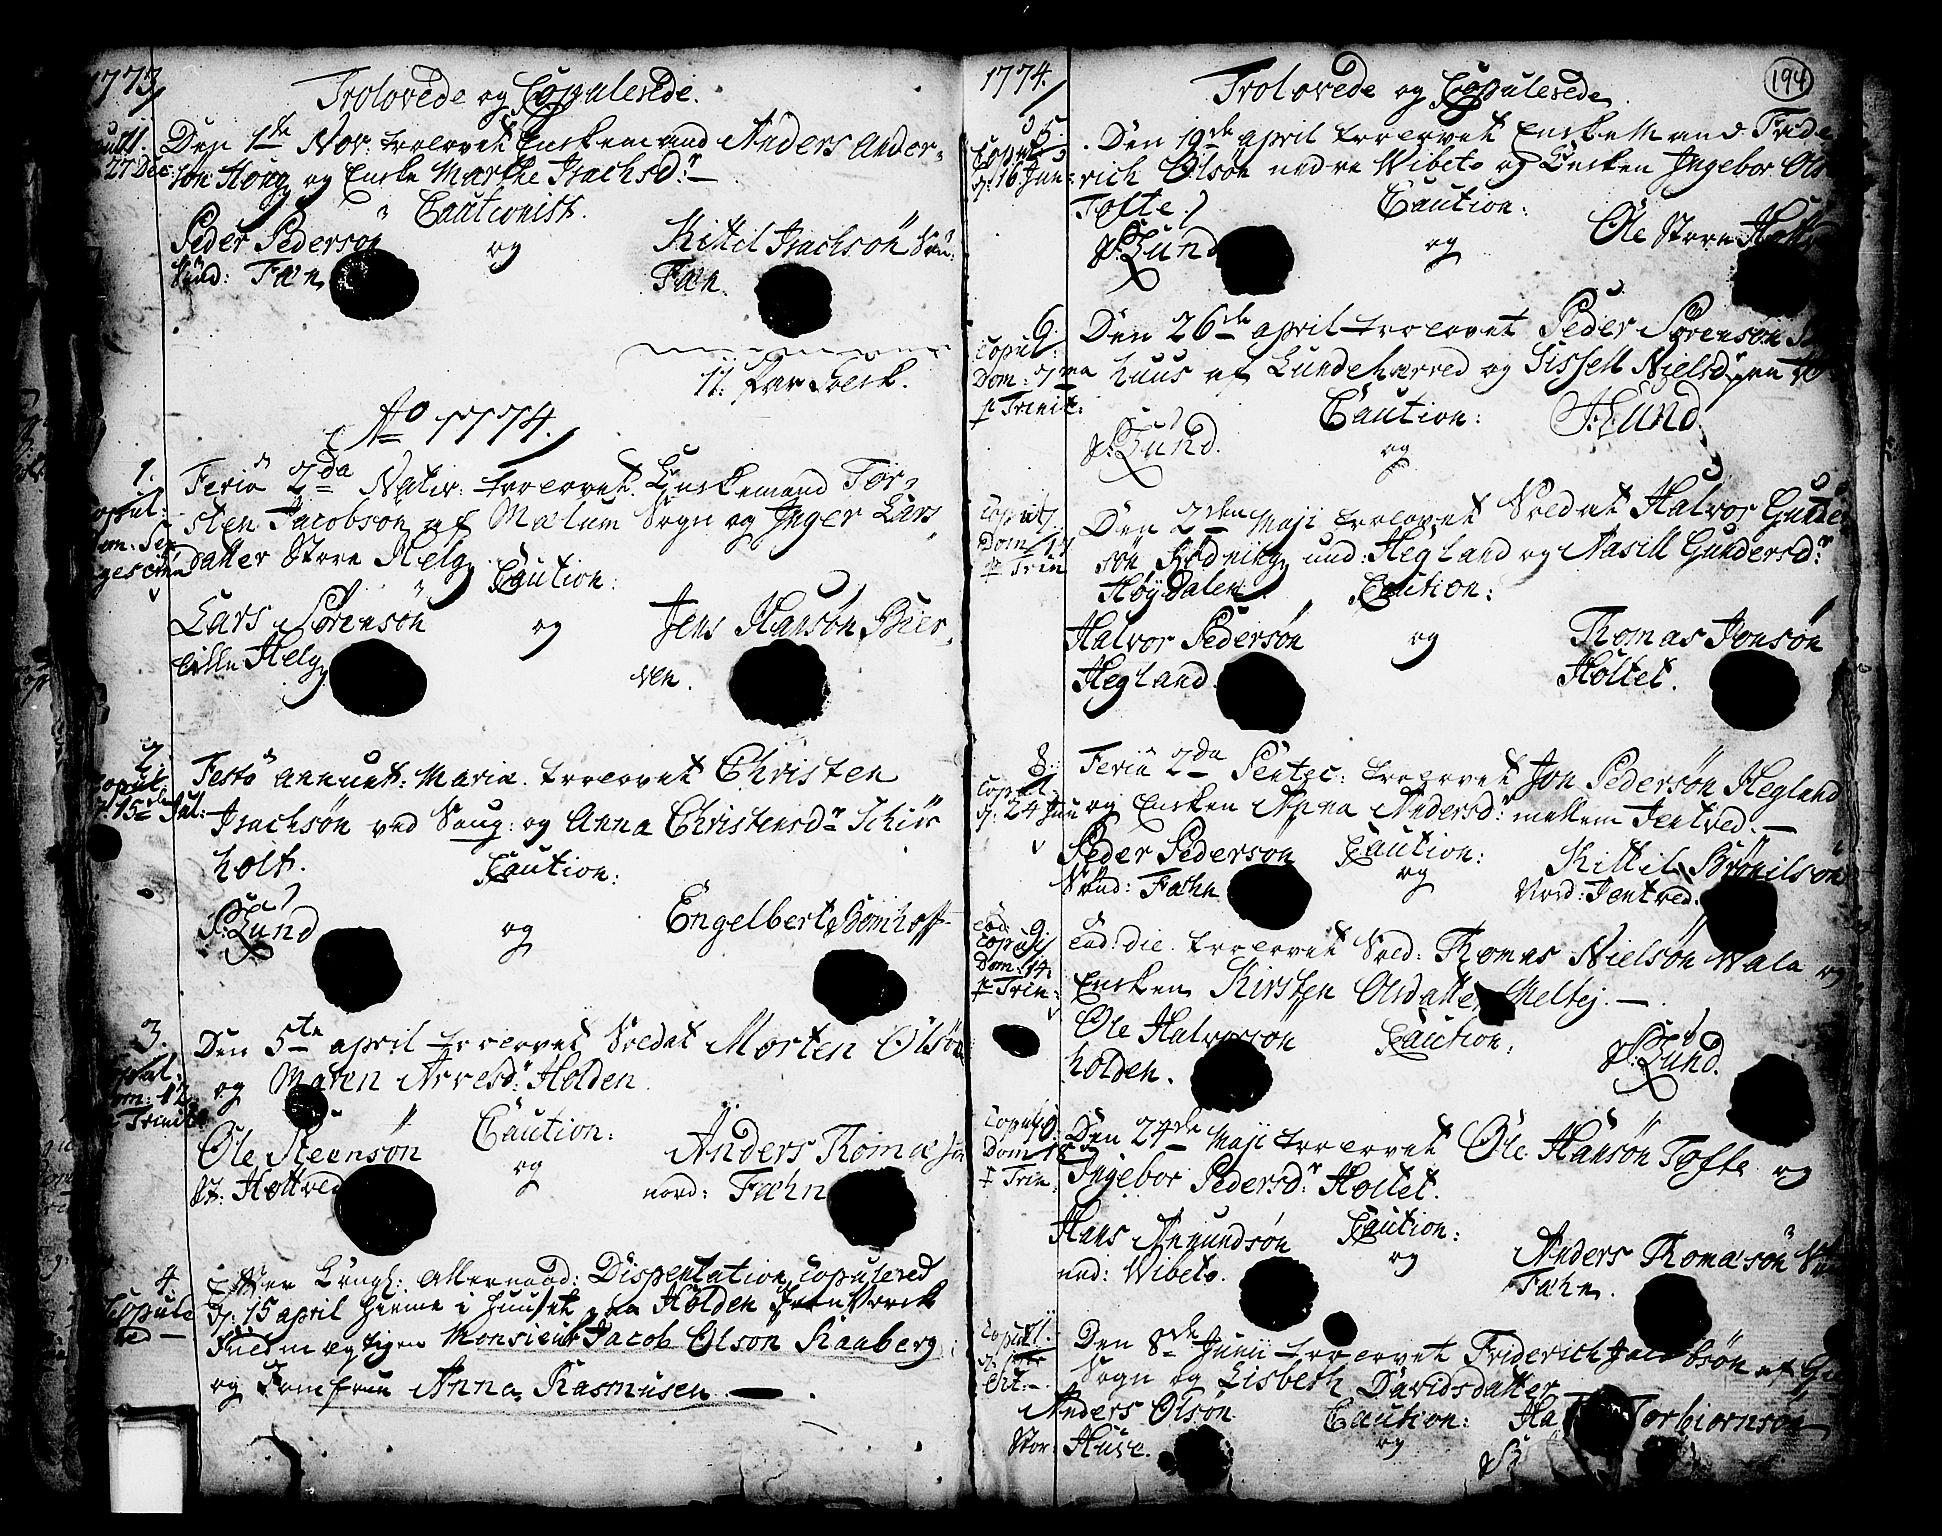 SAKO, Holla kirkebøker, F/Fa/L0001: Ministerialbok nr. 1, 1717-1779, s. 194